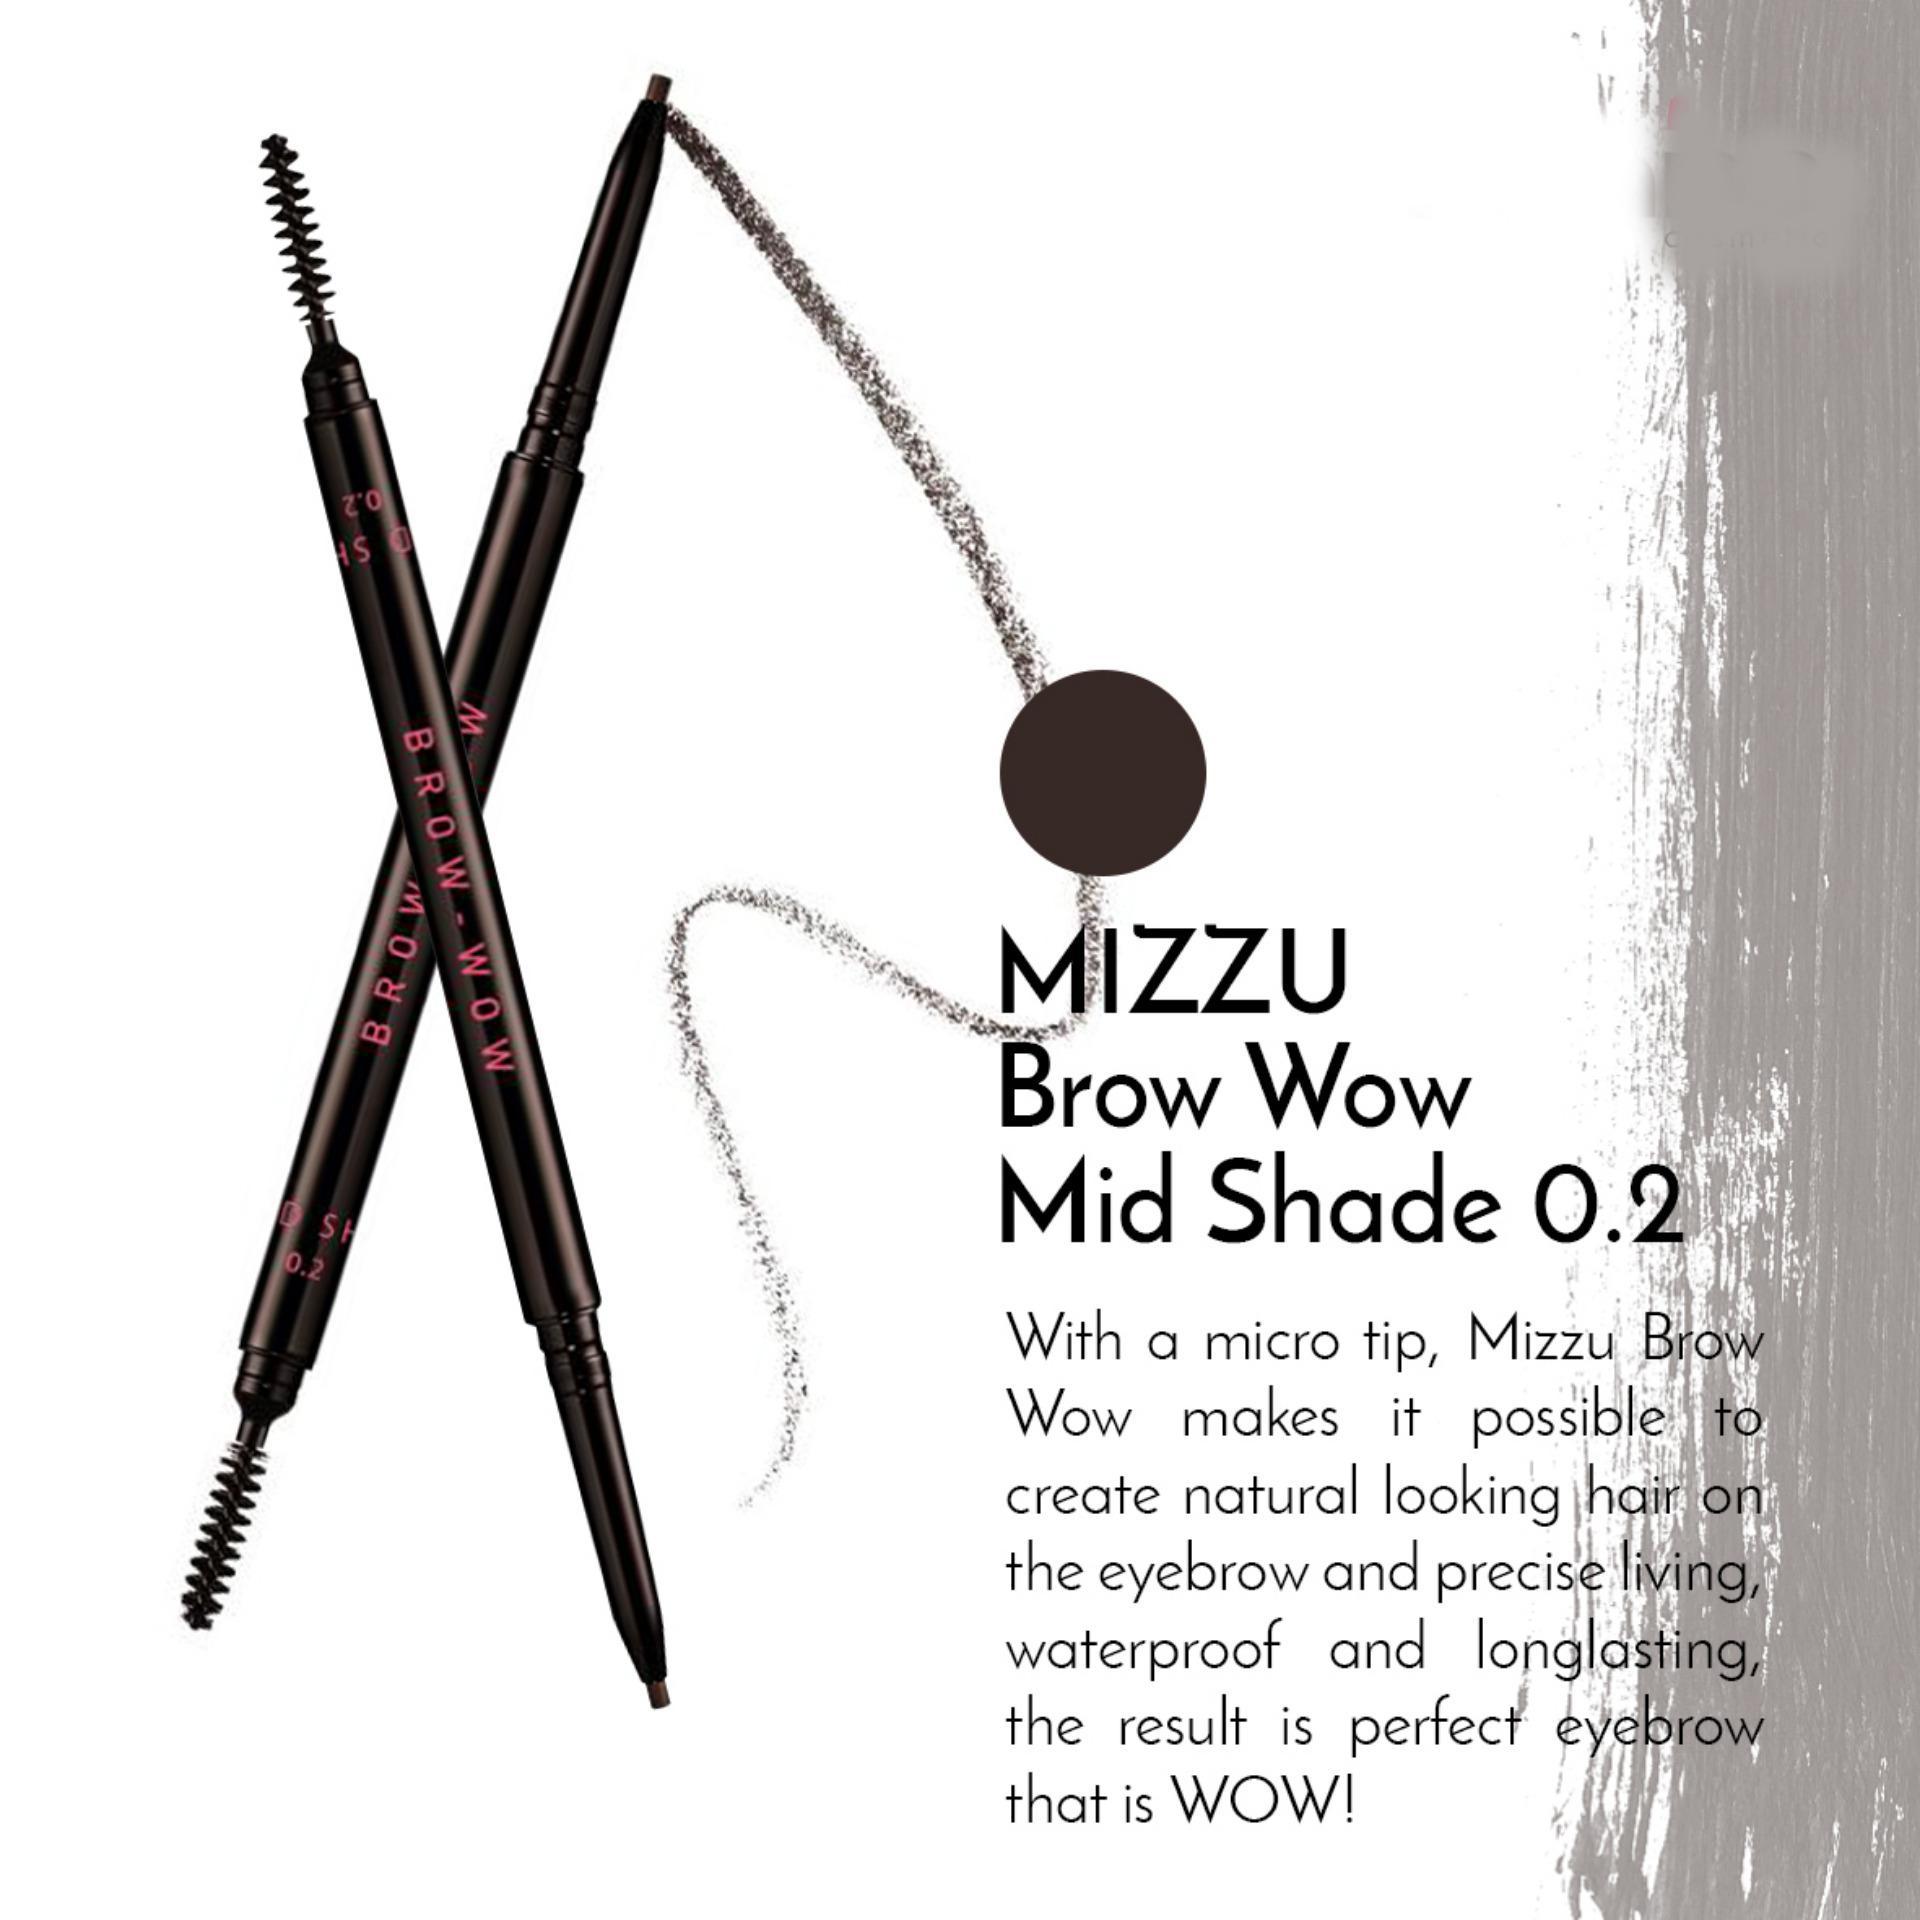 Mizzu Brow Wow Mid Shade 0.2